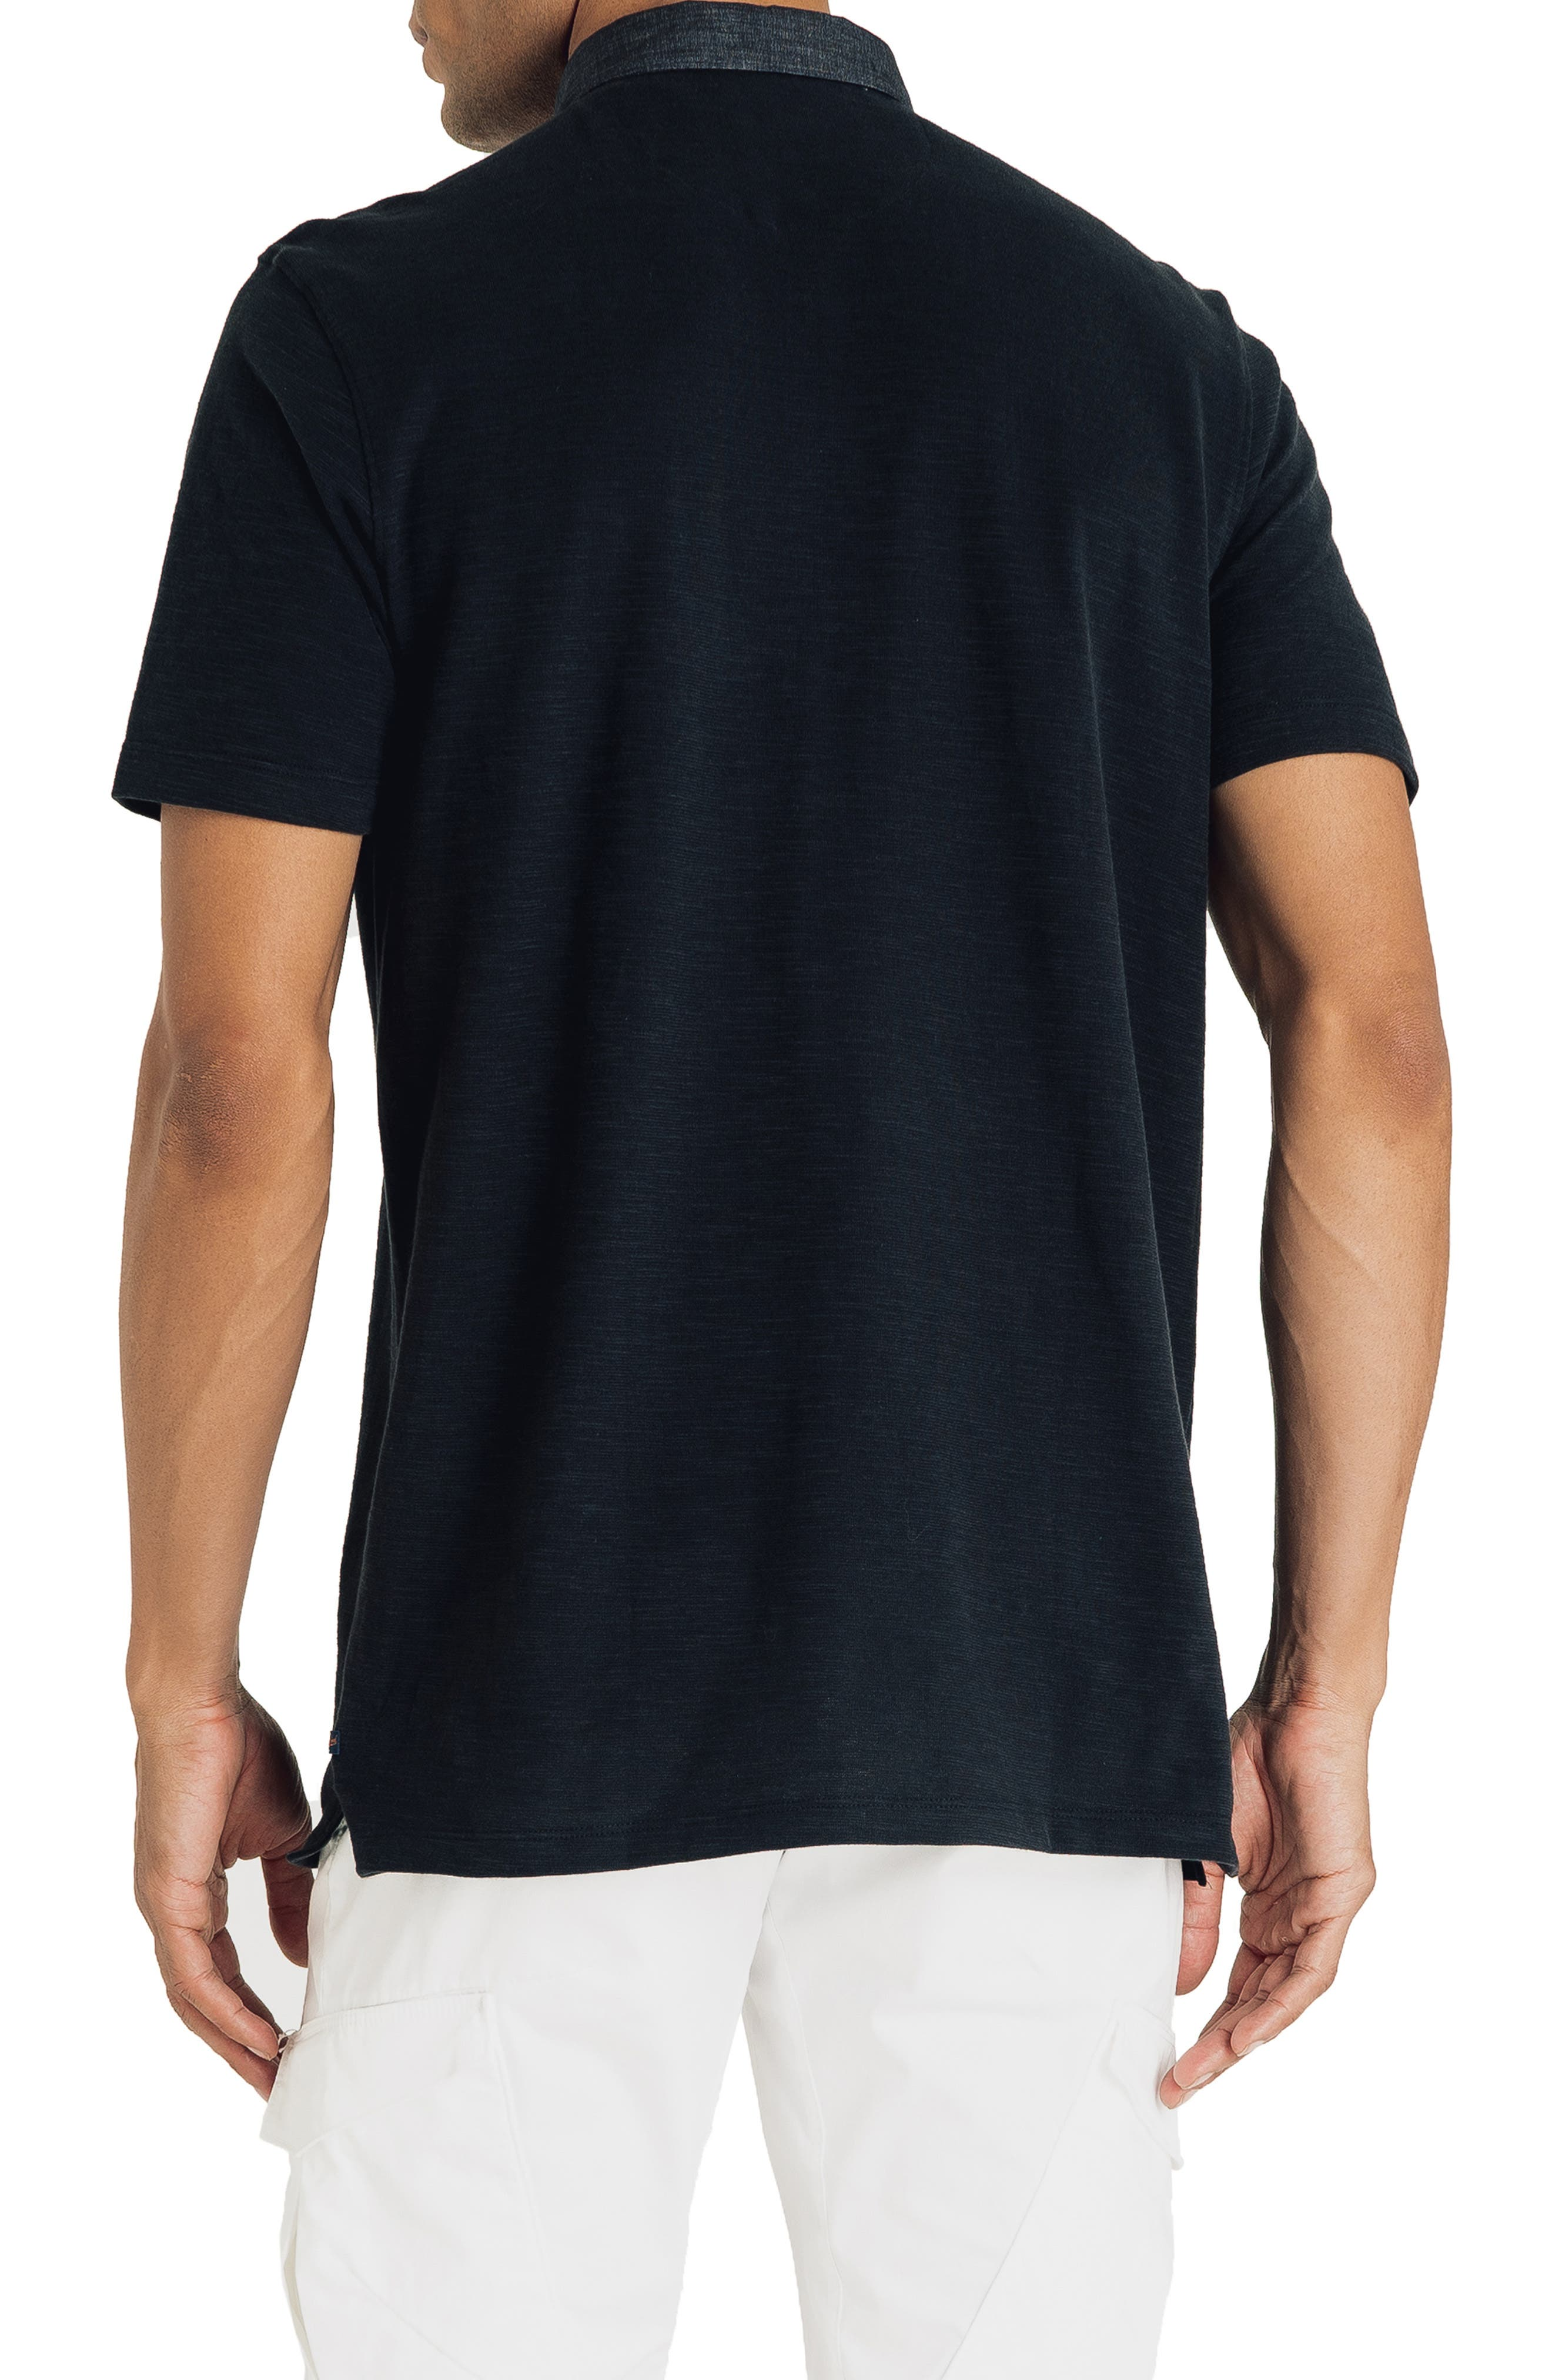 GOOD MAN BRAND, Slub Jersey Cotton Polo Shirt, Alternate thumbnail 2, color, BLACK